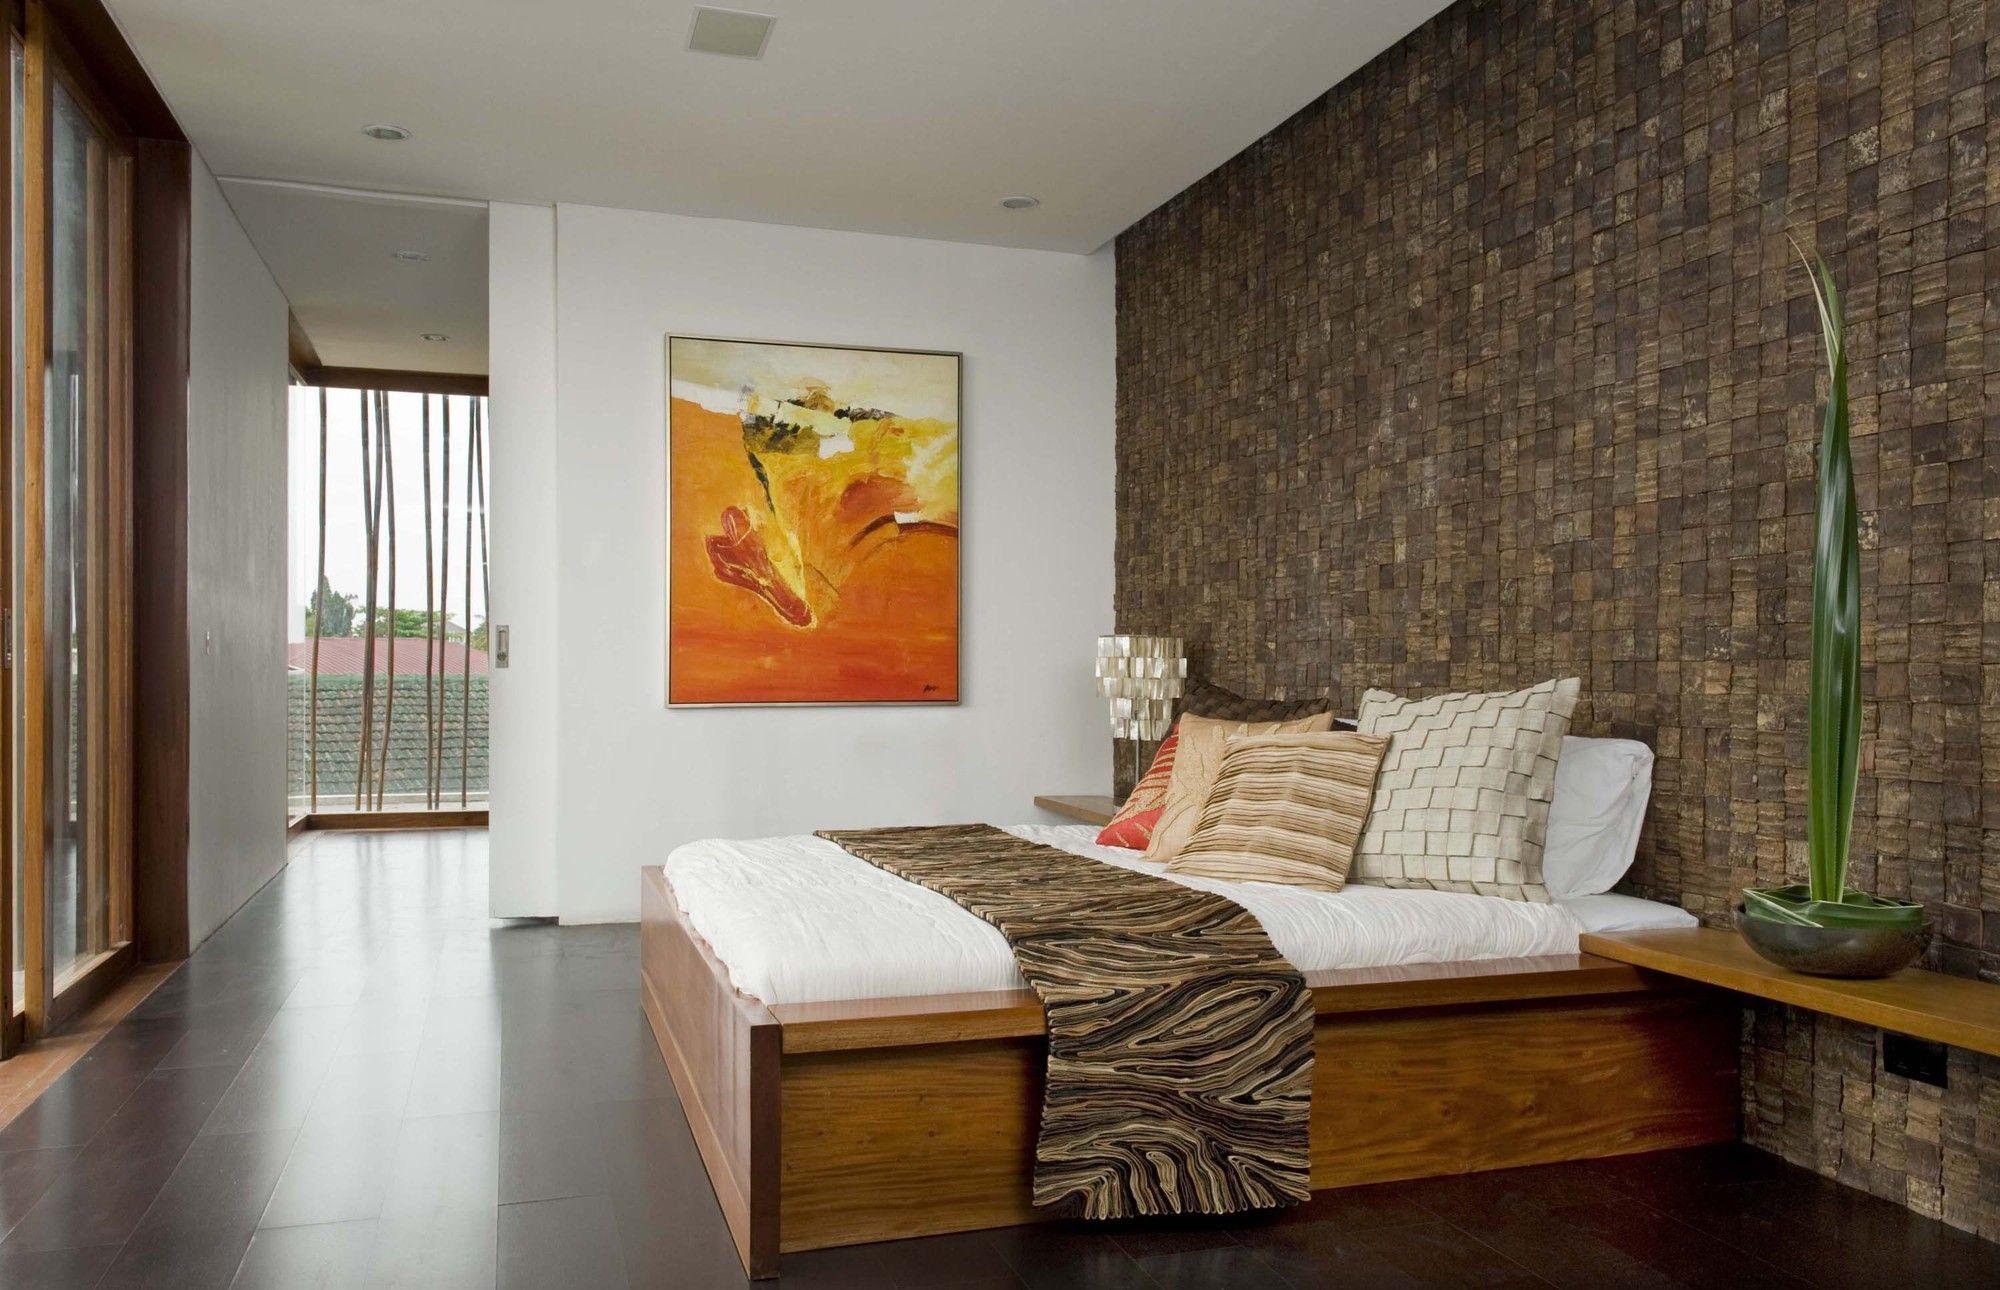 Dise o de casa r stica aprende a decorar con materiales - Disenos casas rusticas ...